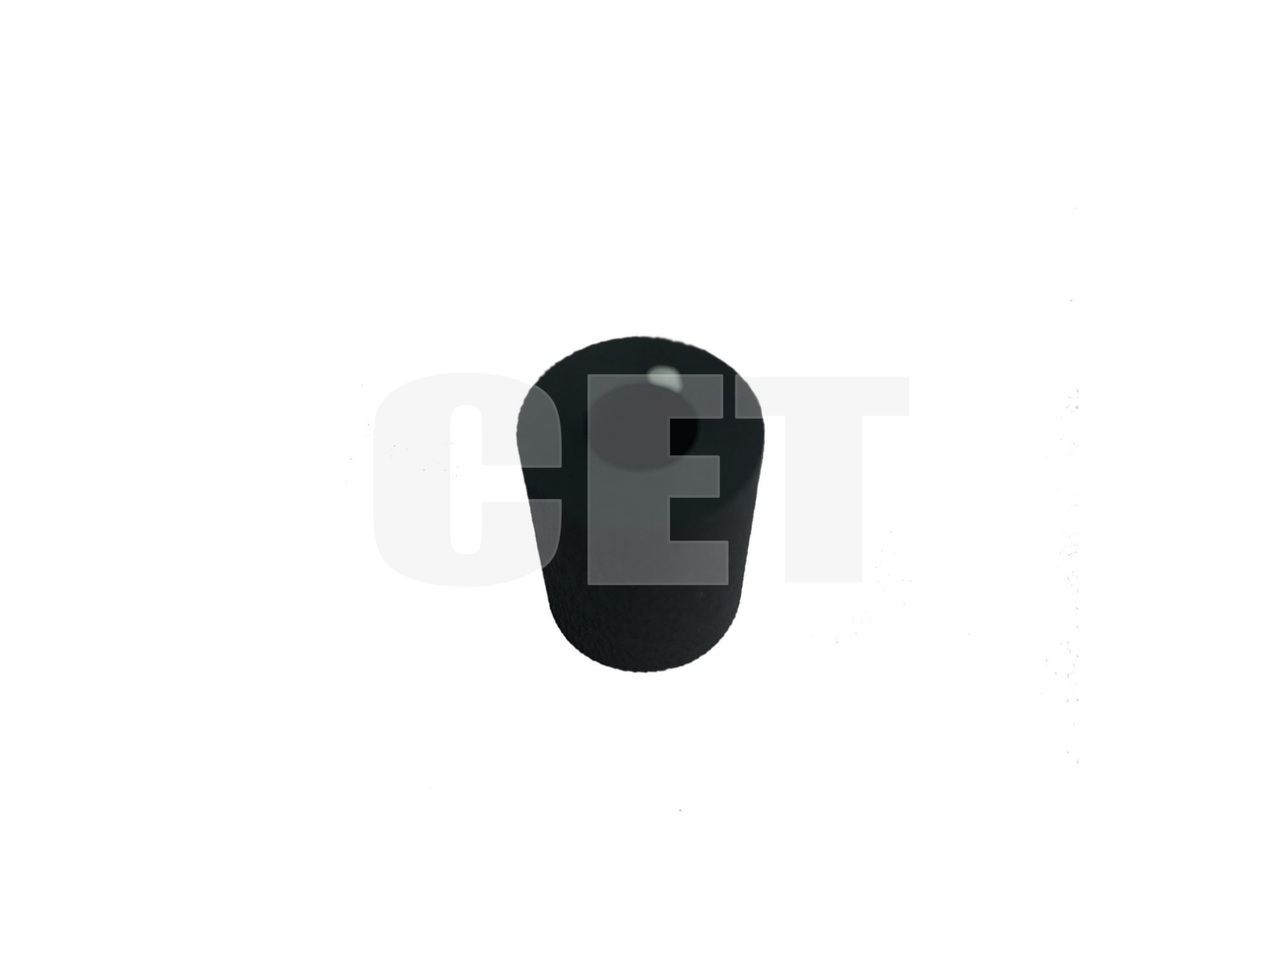 Резинка ролика подхвата 2HN06080 для KYOCERAFS-6025MFP/TASKalfa 255/305 (CET), CET7806BPT,CET7806BPTR